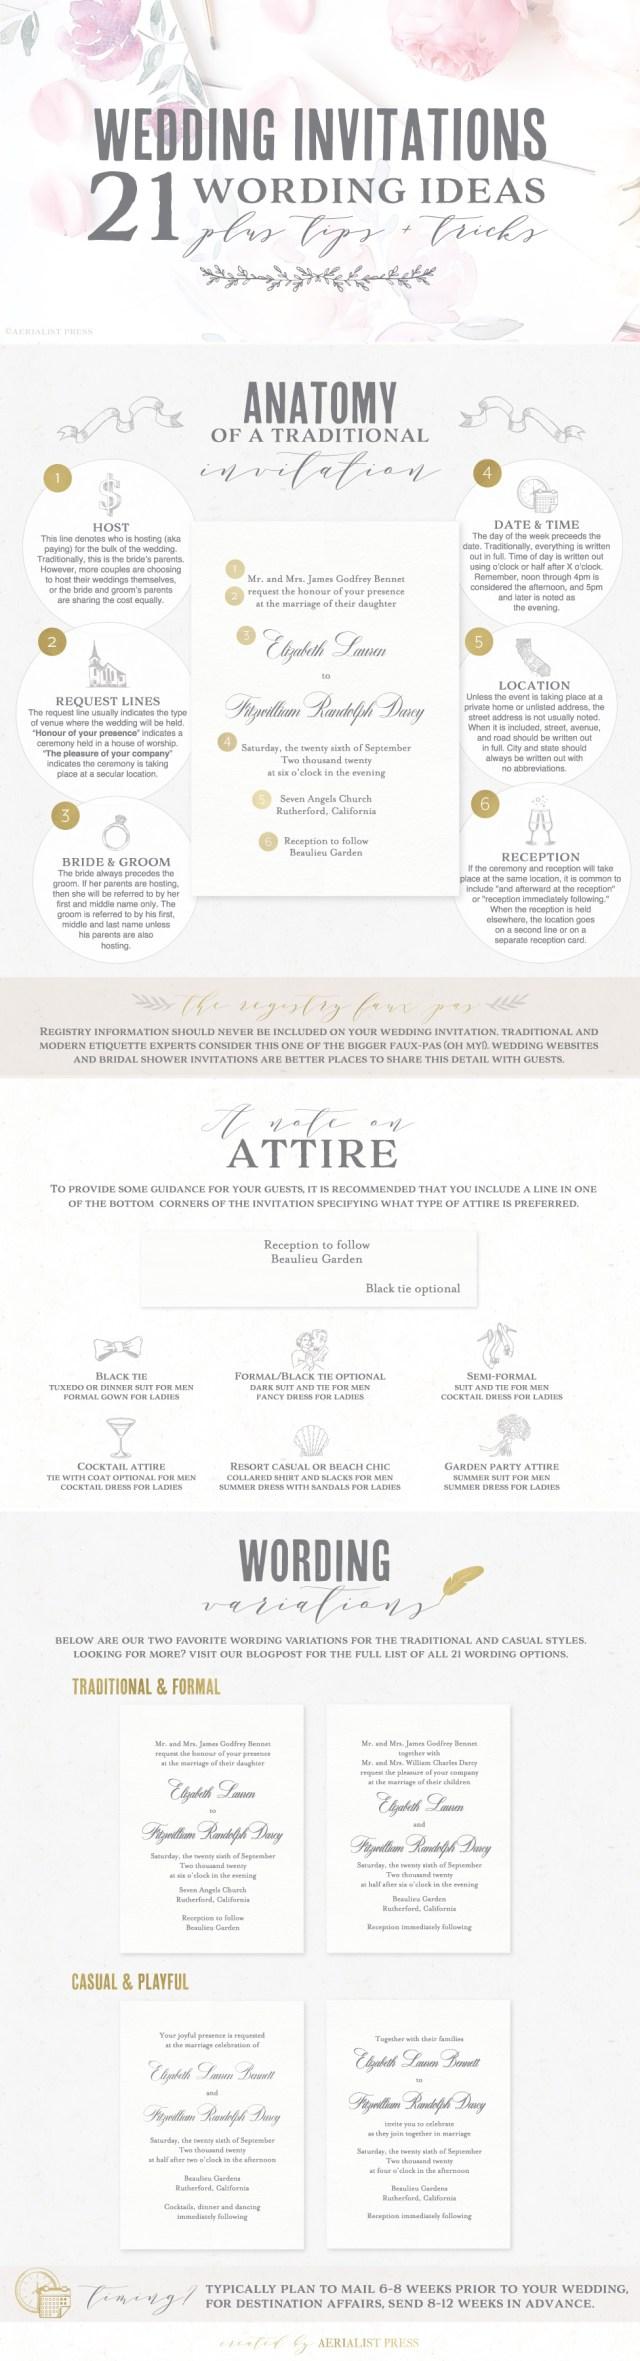 Wedding Invitation Wording Ideas 21 Best Wedding Invitation Wording Ideas Aerialist Press